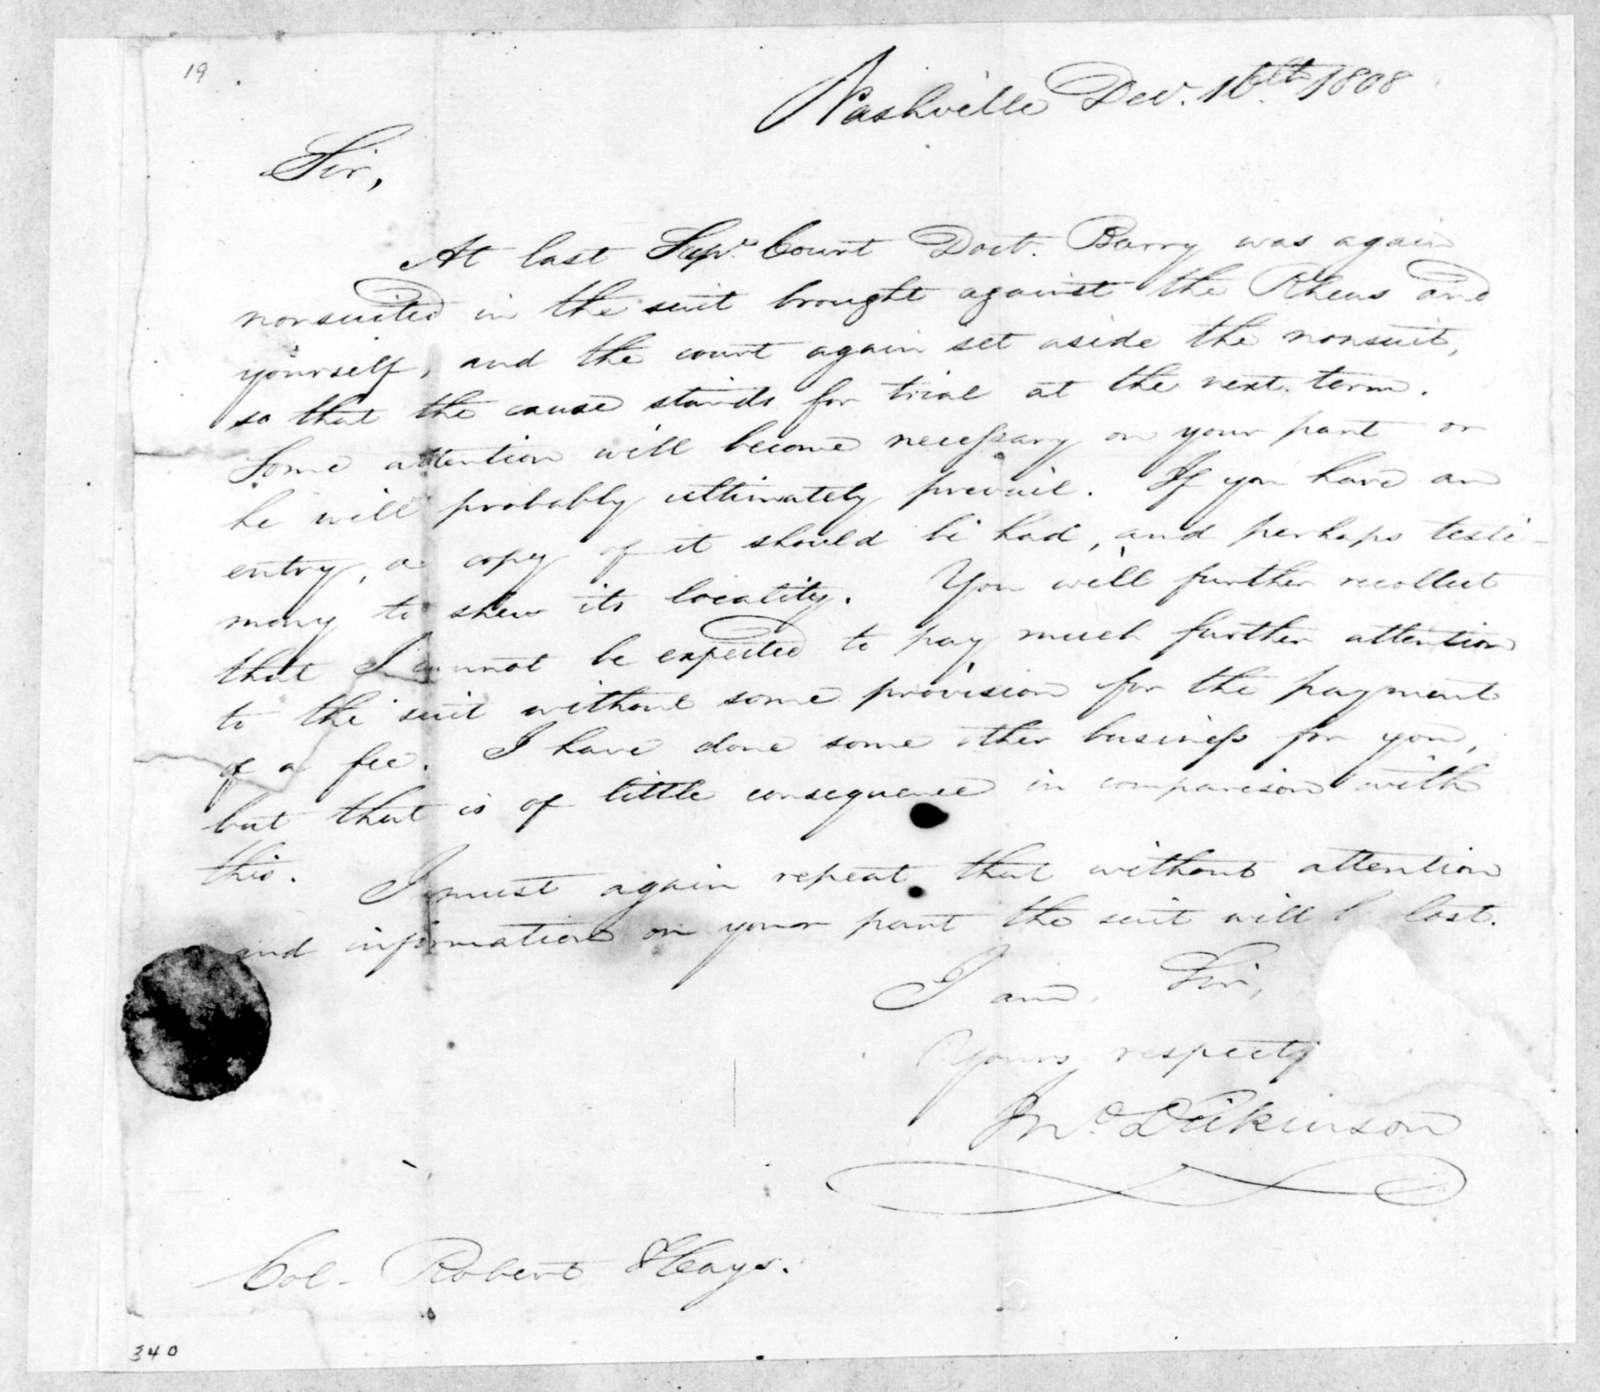 John Dickinson to Robert Hays, December 16, 1808